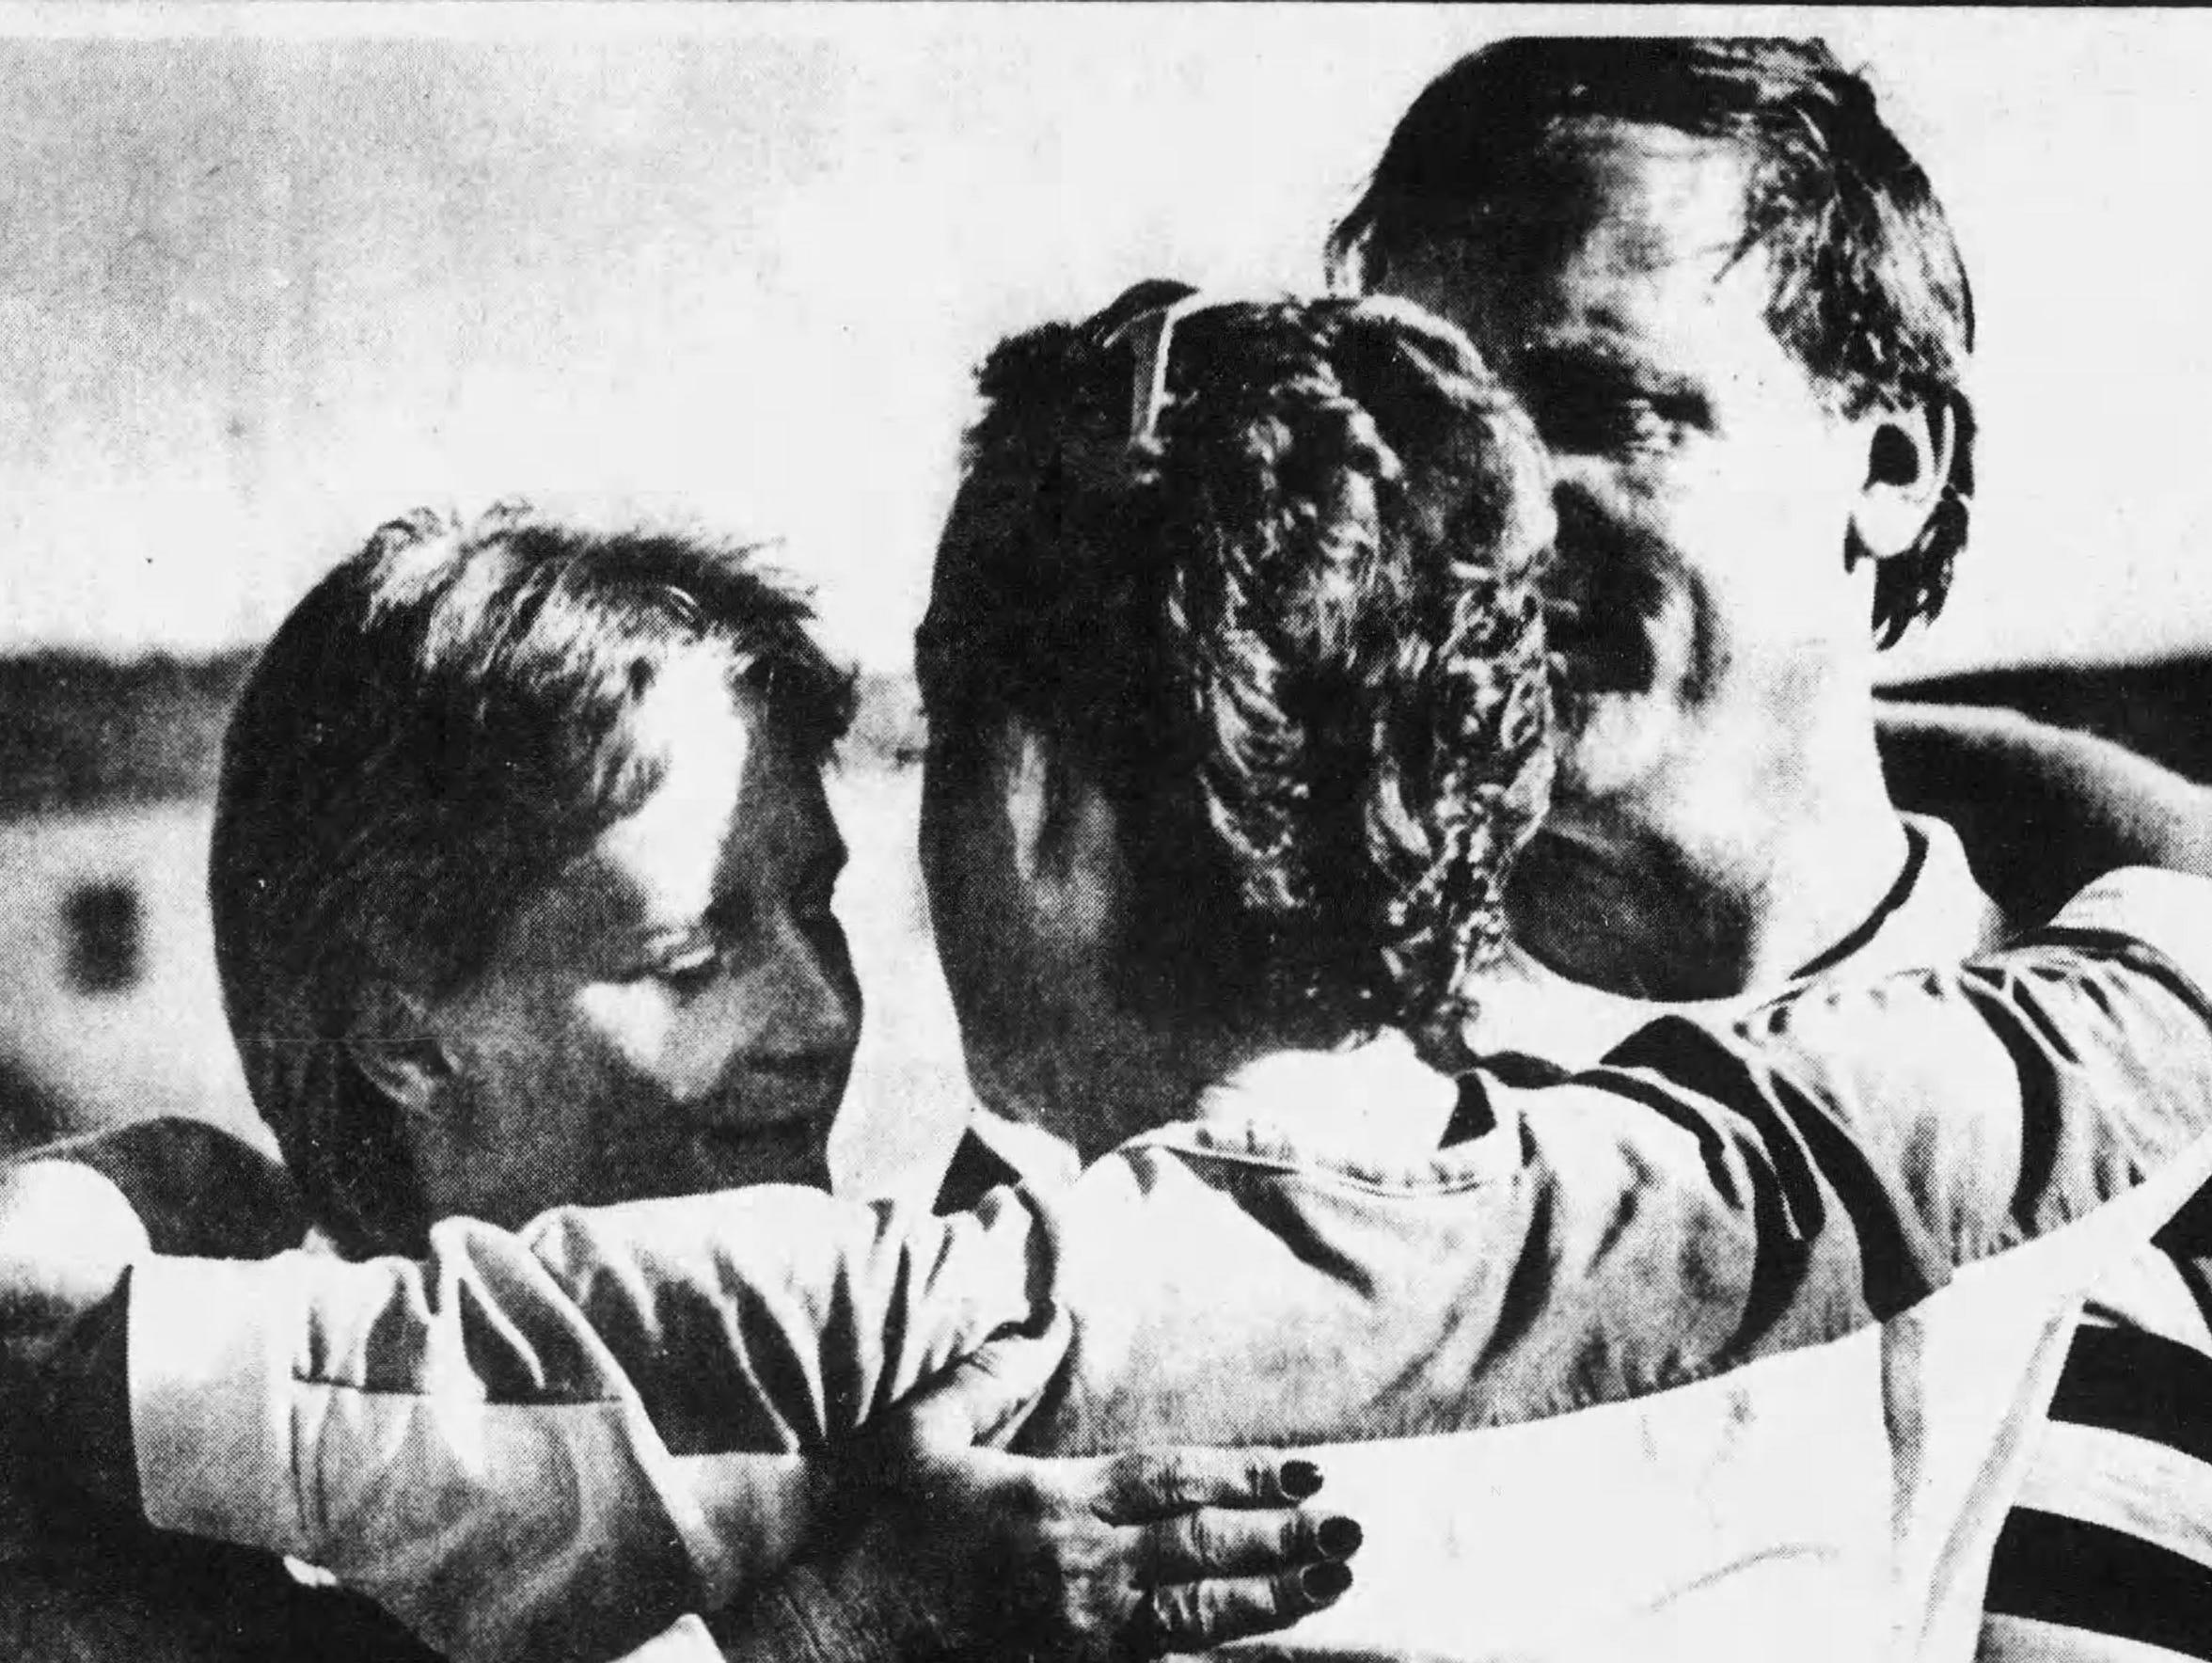 Jean and David Lindsey get a hug from Binghamton Councilwoman